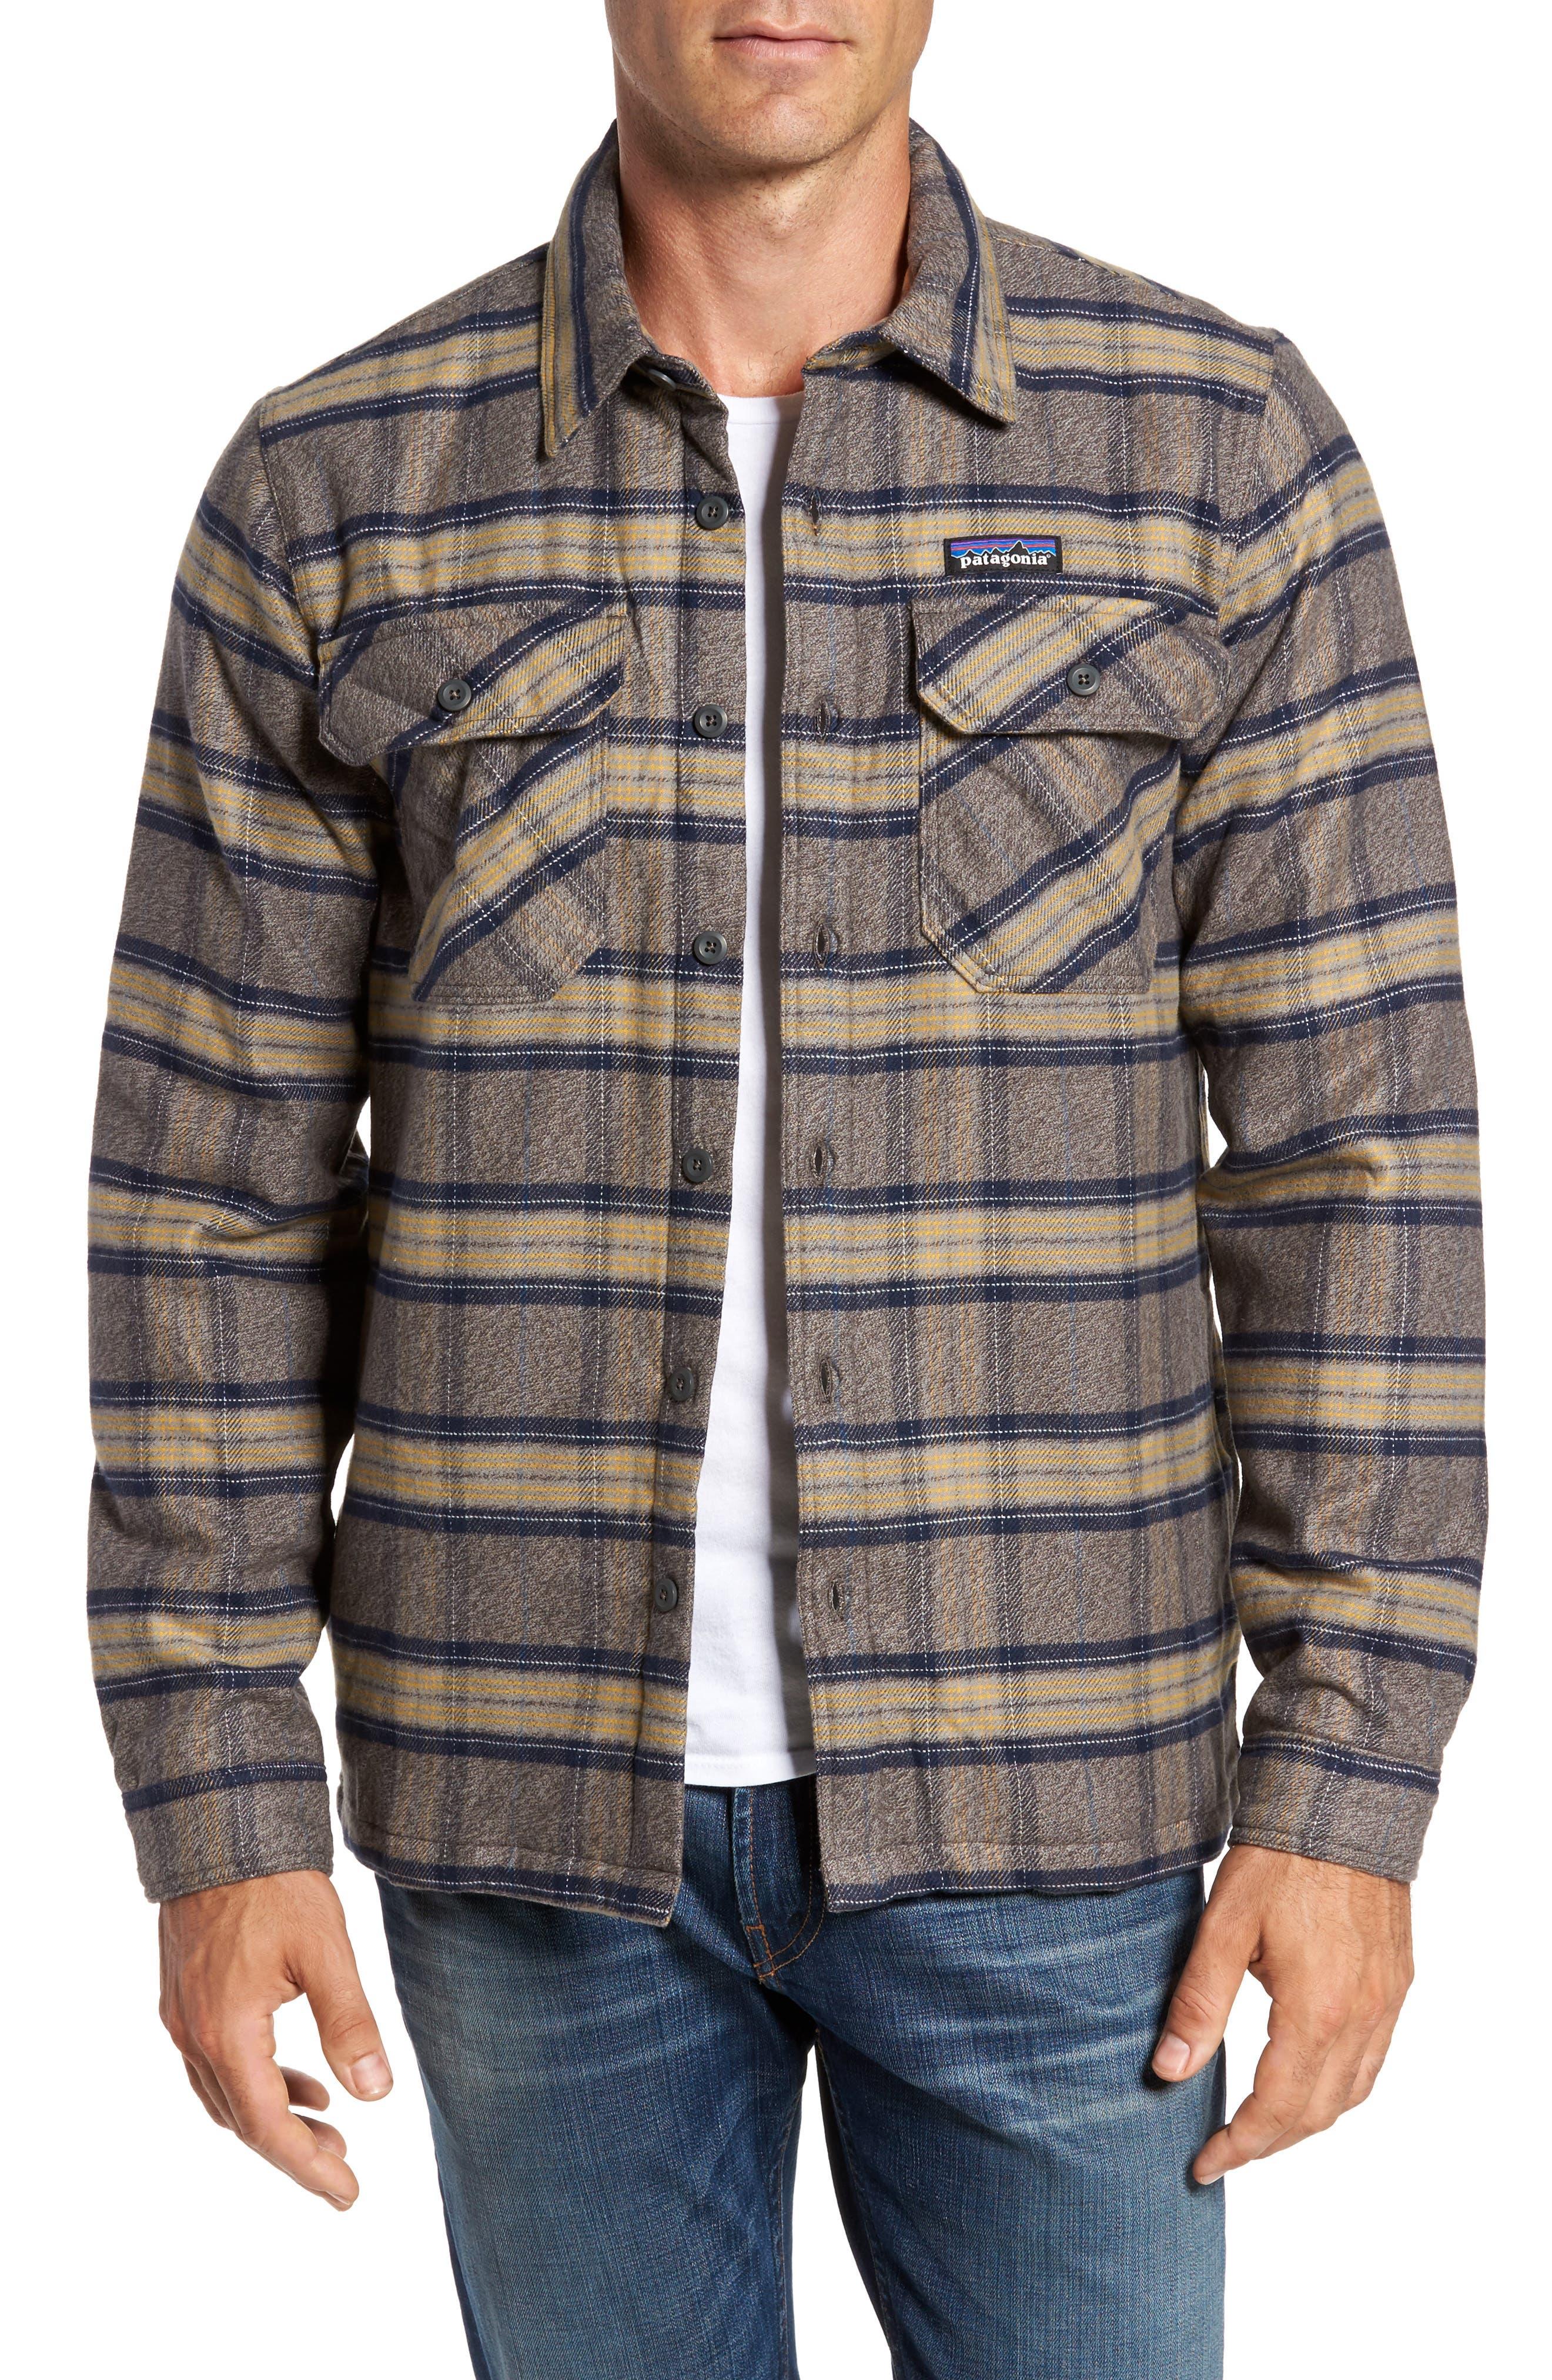 Alternate Image 1 Selected - Patagonia 'Fjord' Flannel Shirt Jacket